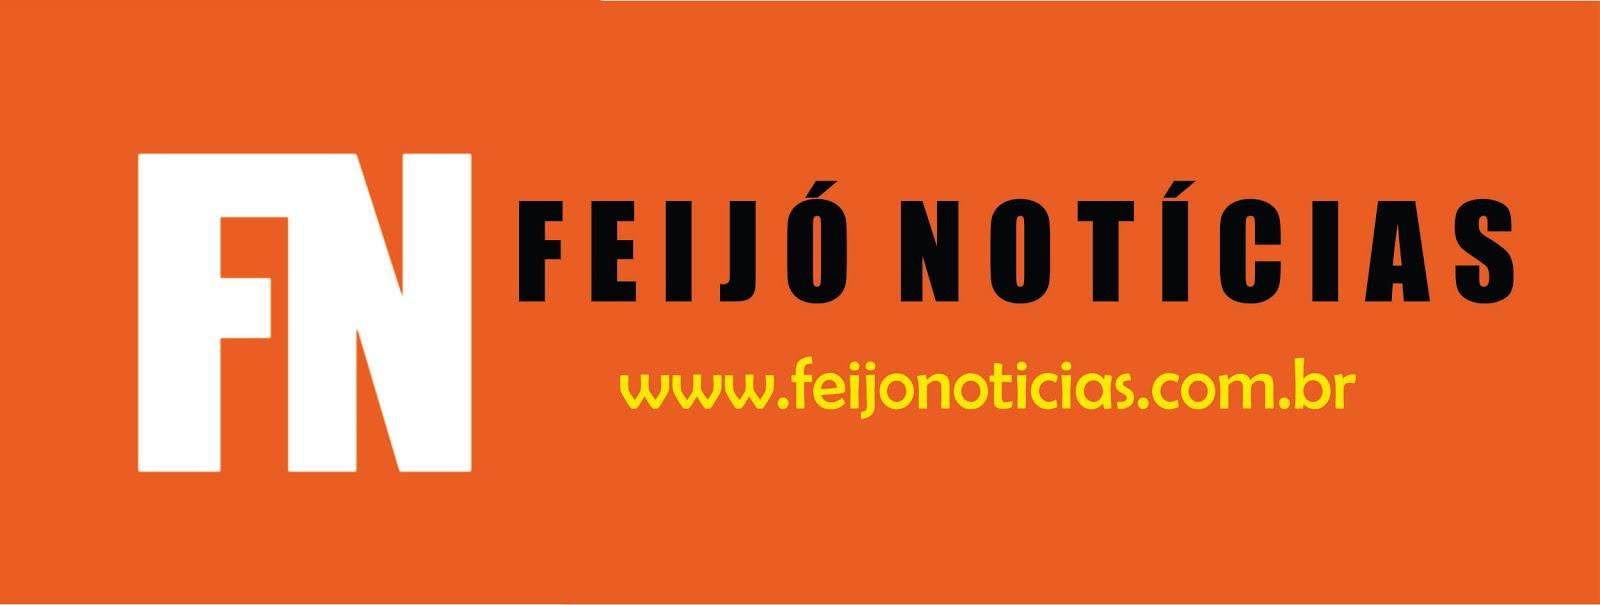 Feijó Noticias